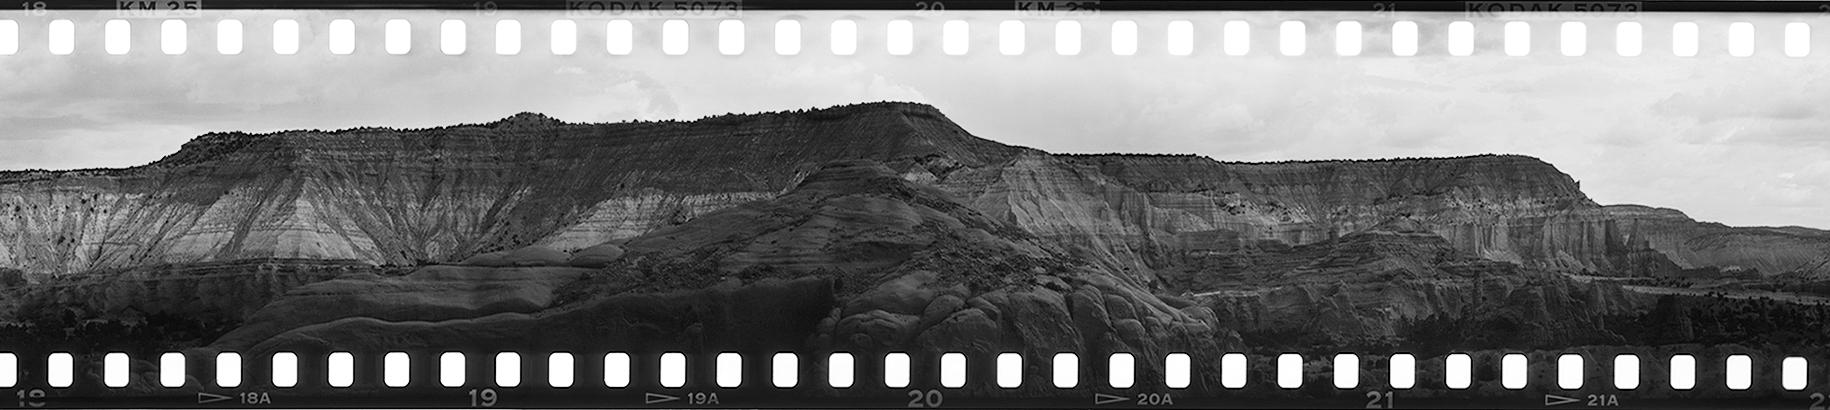 Kodak - Panorama Trail (Detail) • 2016 • Kodachrome Basin State Park, UT • 35mm Kodachrome (Black & White Reversal)